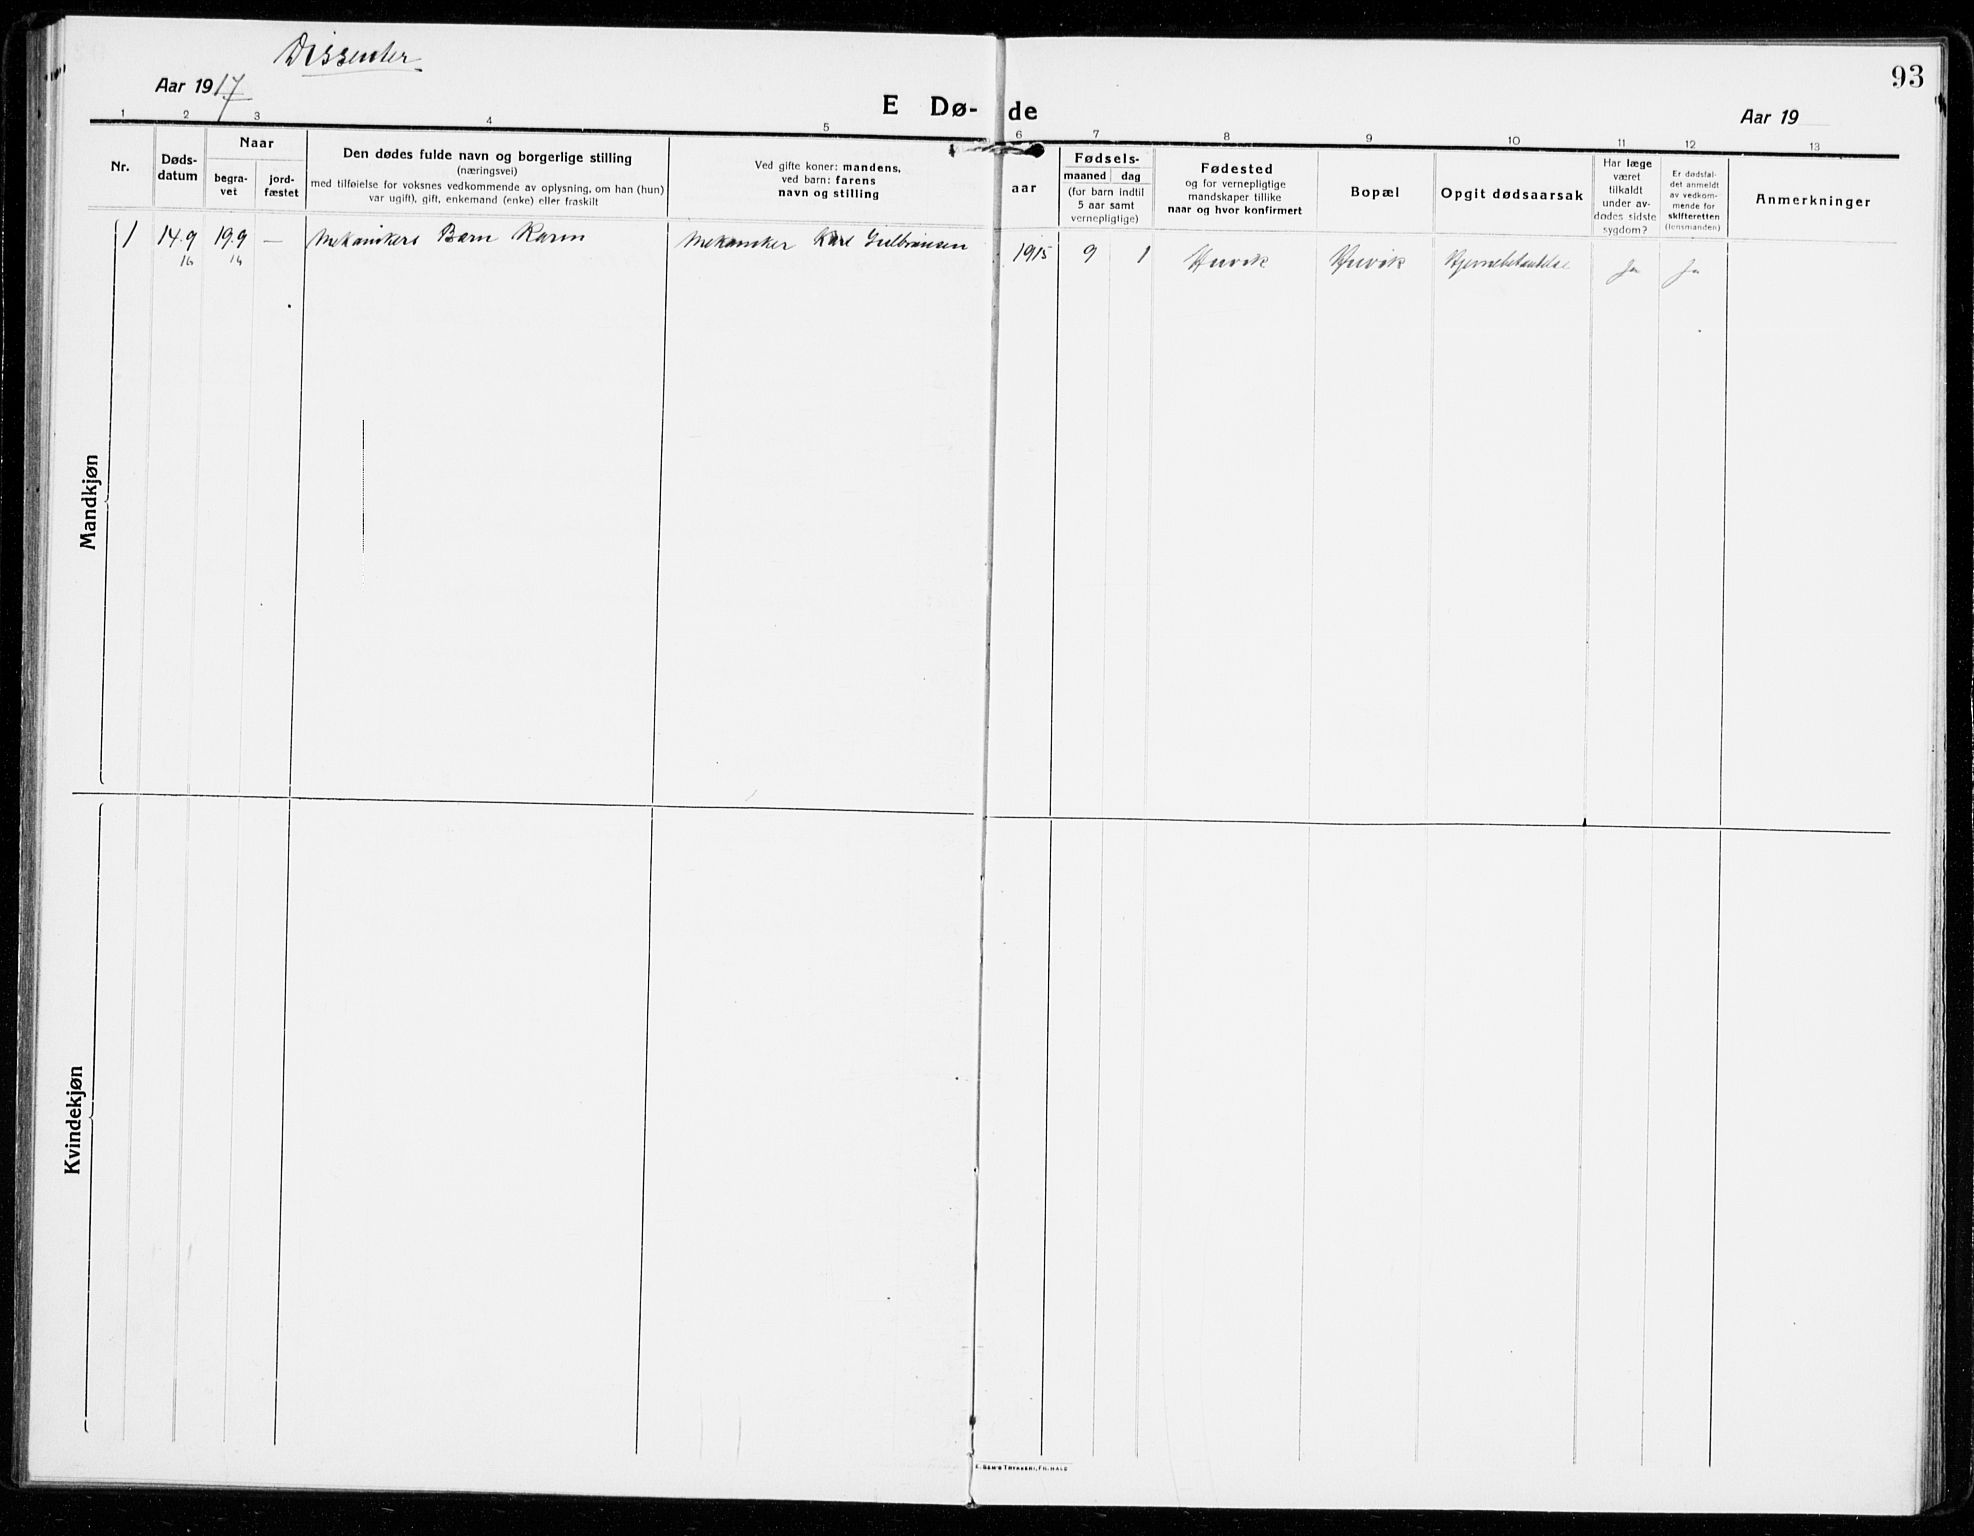 SAKO, Sandar kirkebøker, F/Fa/L0020: Parish register (official) no. 20, 1915-1919, p. 93